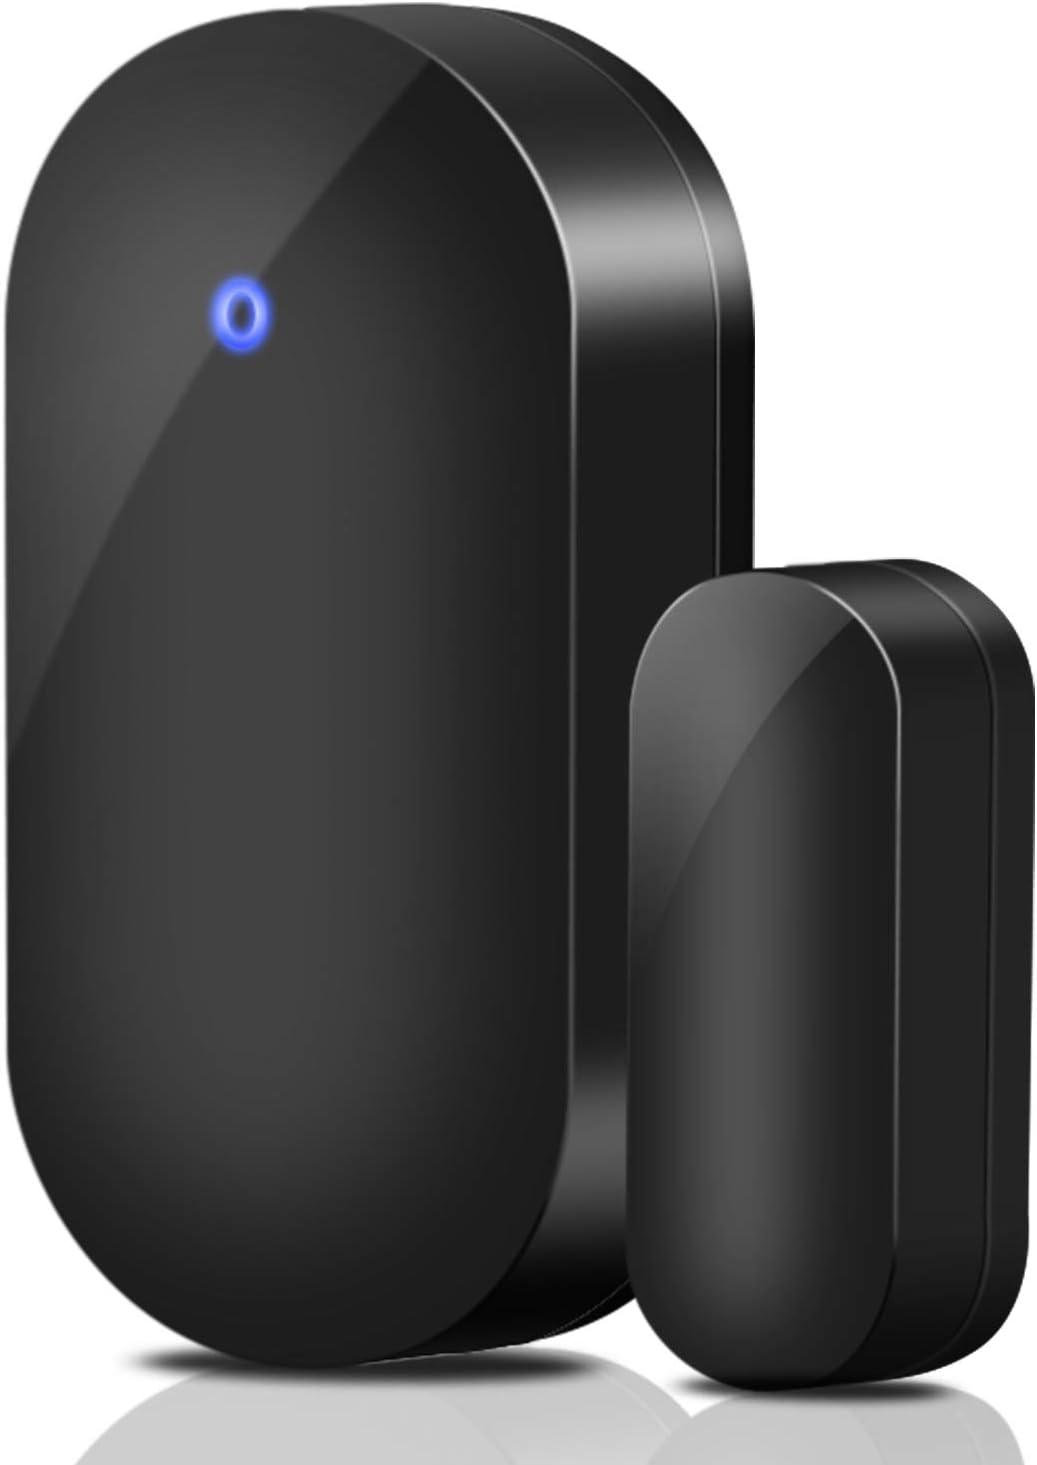 PHYSEN - Mini sensor de ventana de puerta magnético inalámbrico, sensor de alarma para timbre de entrada, alarma de puerta interior, color negro